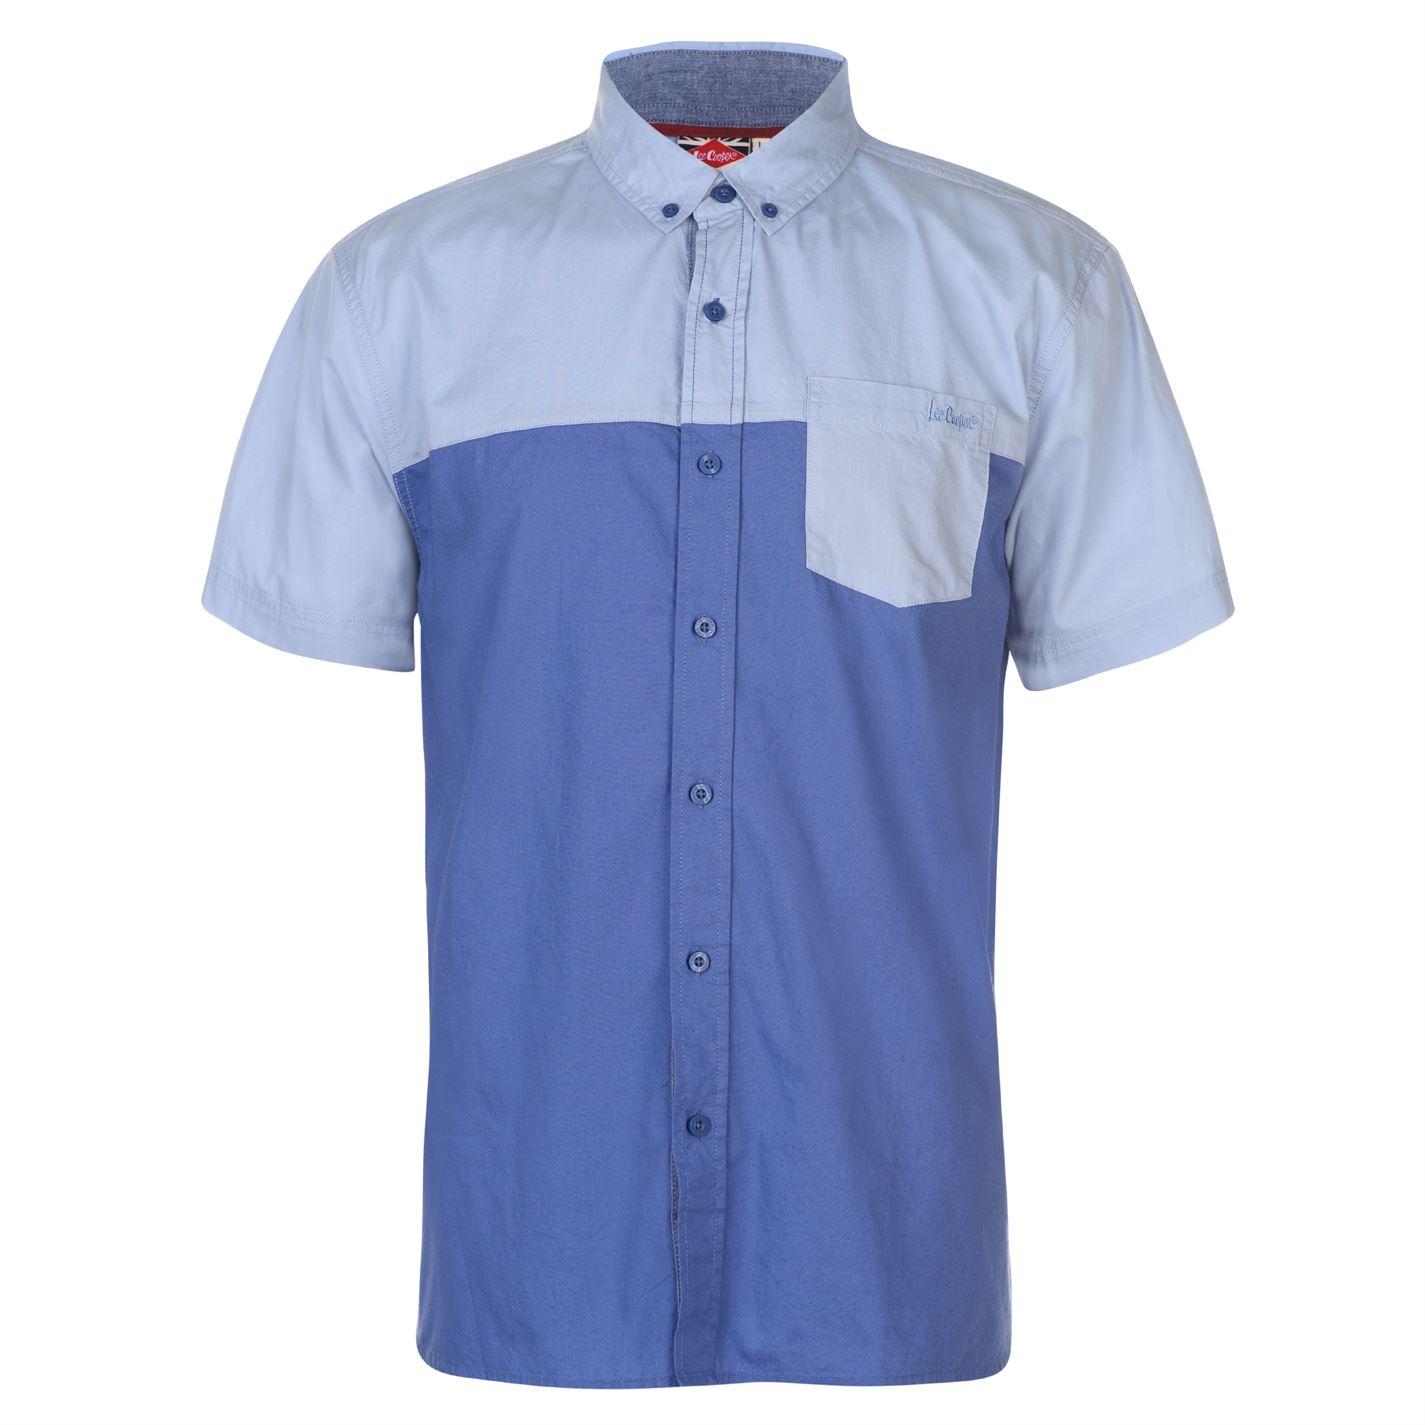 Lee Cooper Short Sleeve Shirt Mens